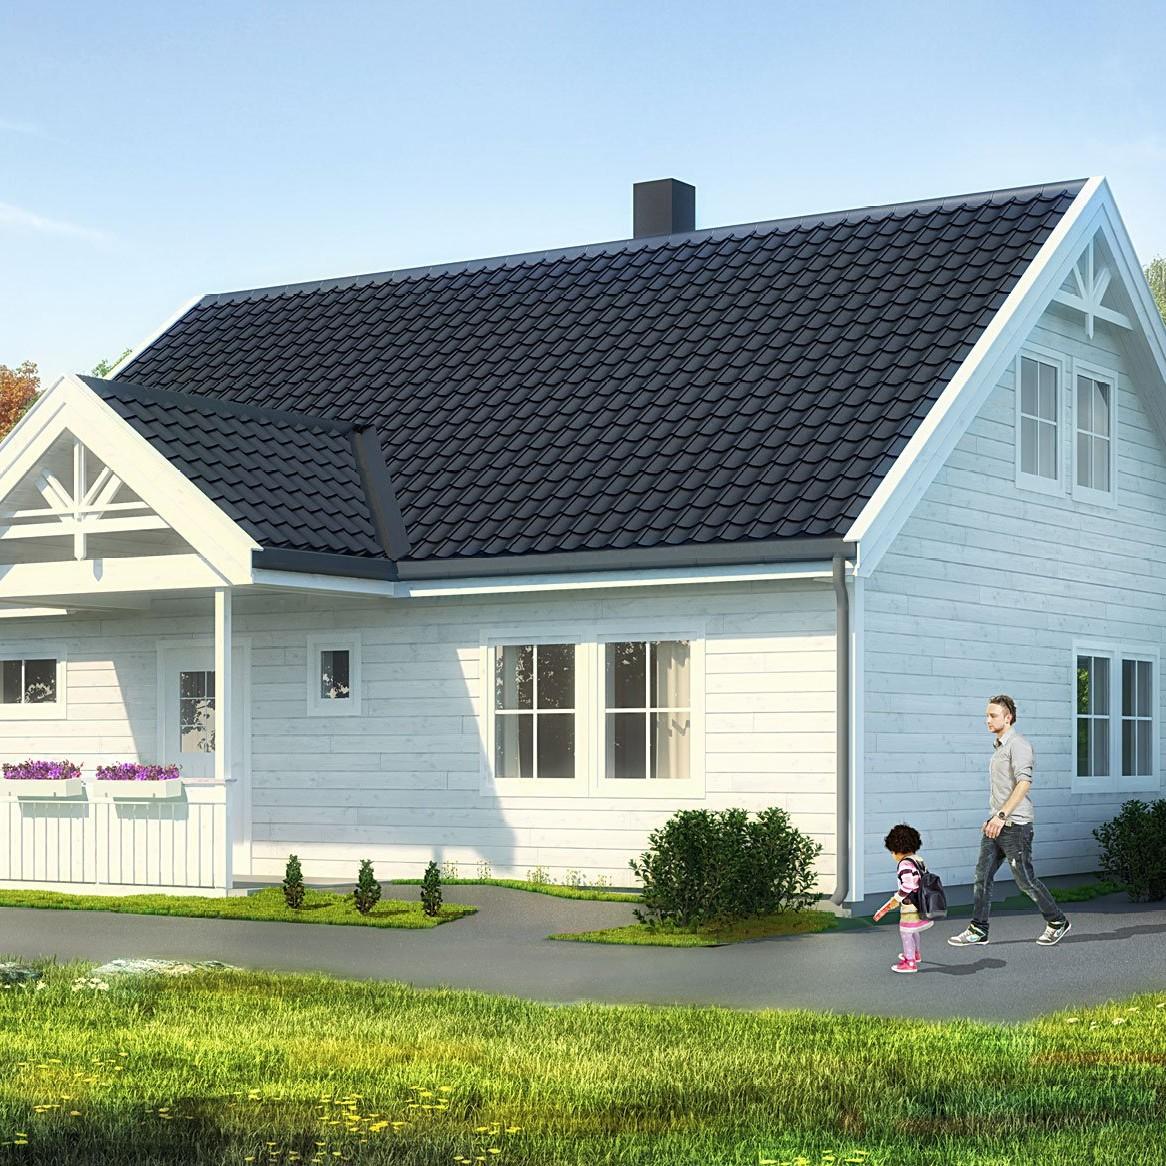 Kvadratmeterpris bygge hus